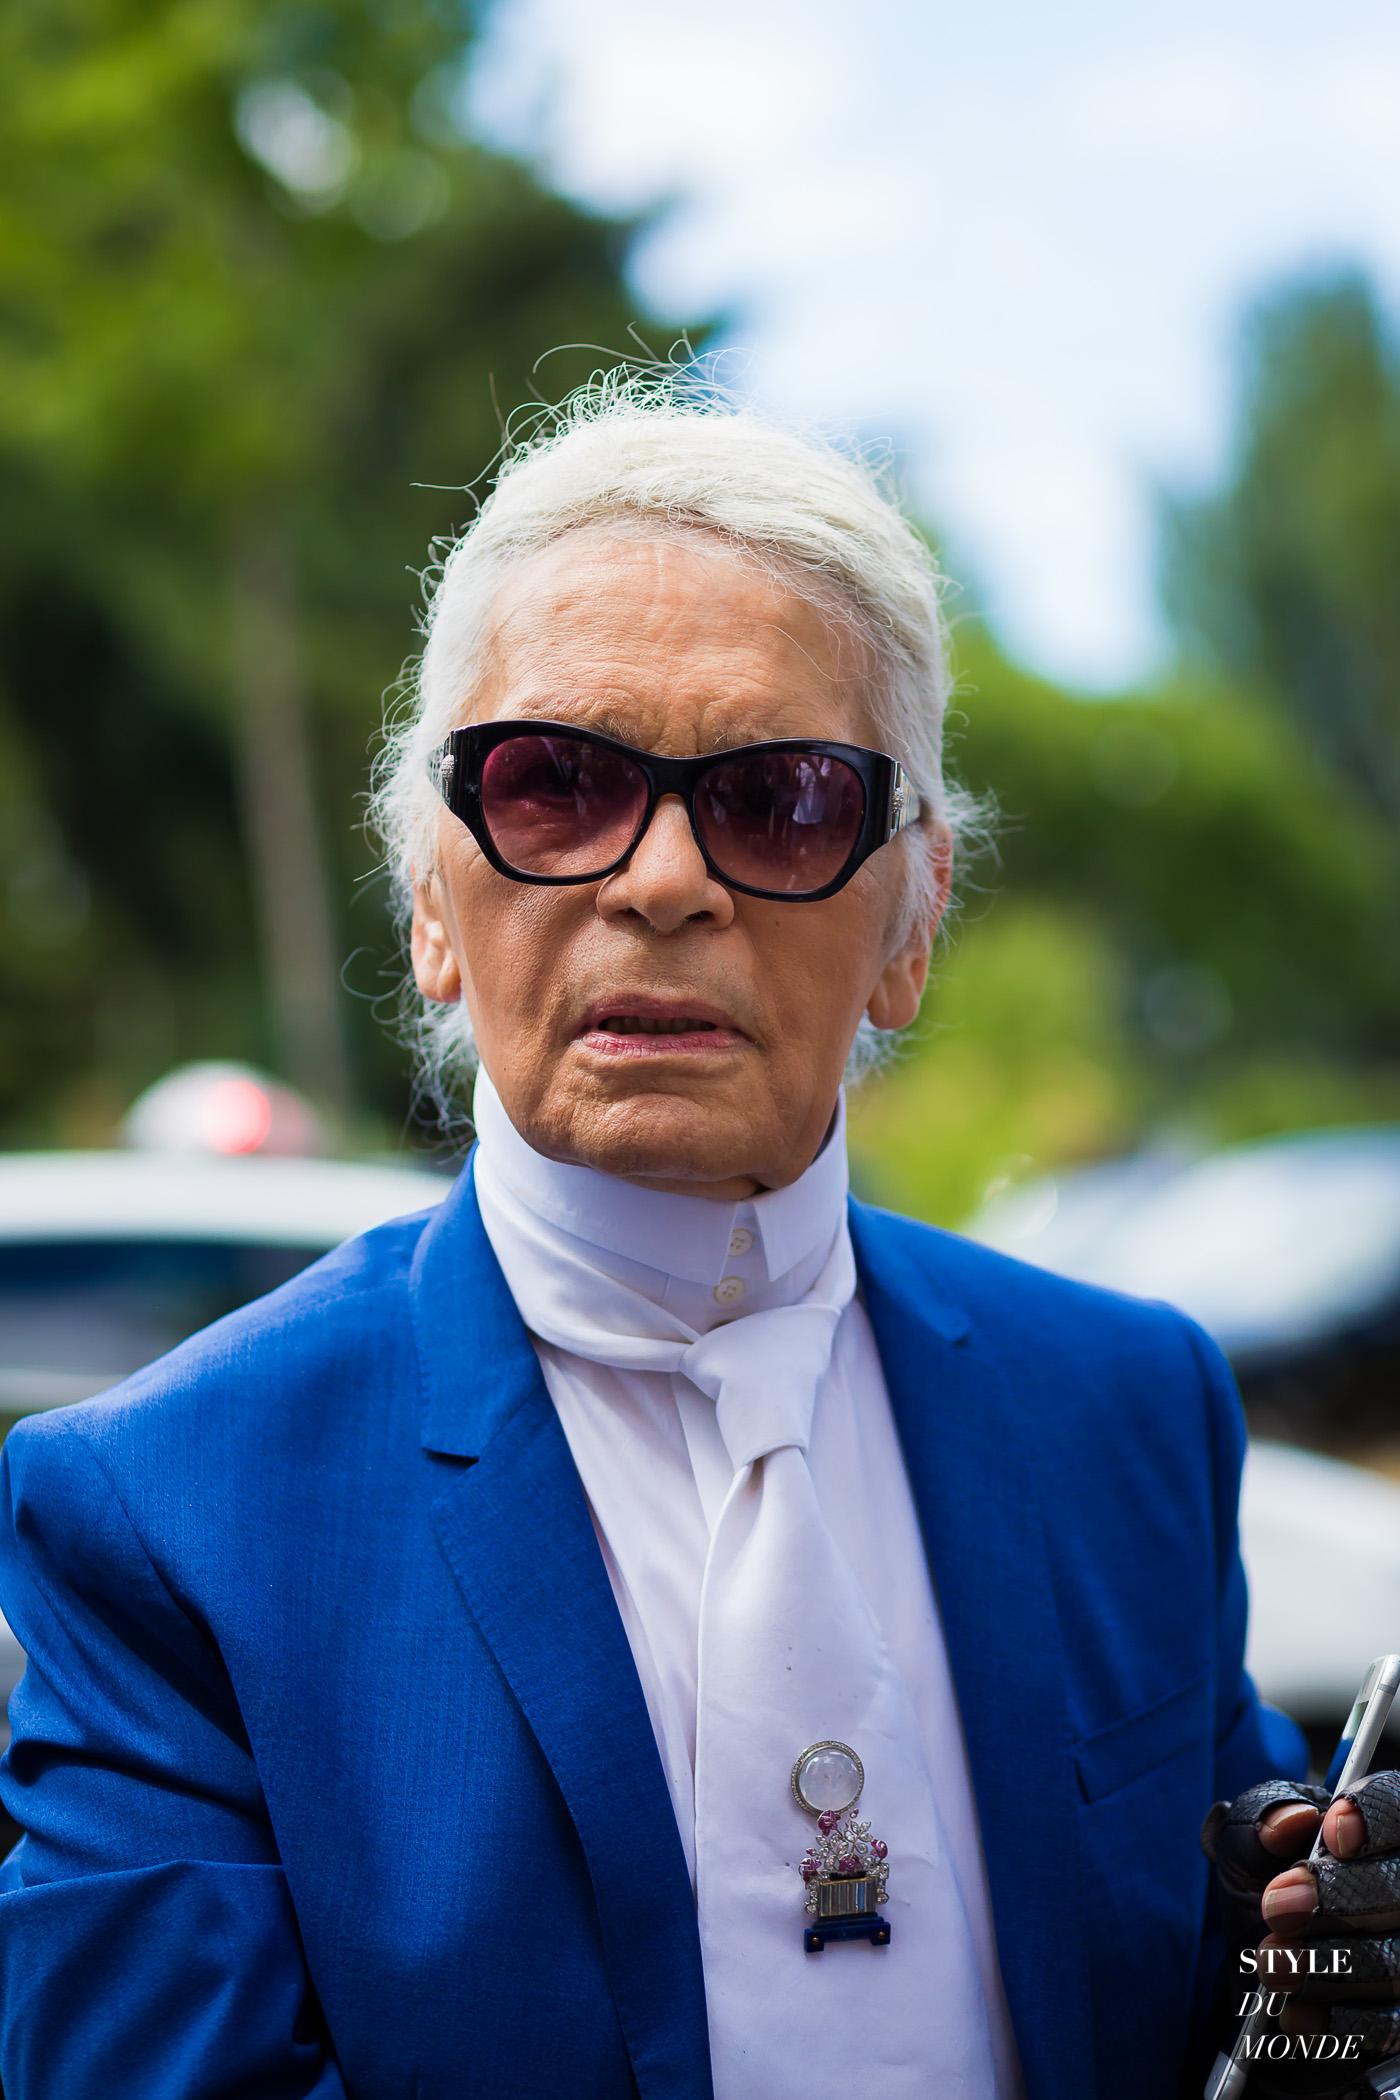 3adcd37db8 Karl Lagerfeld at Dior Homme - STYLE DU MONDE